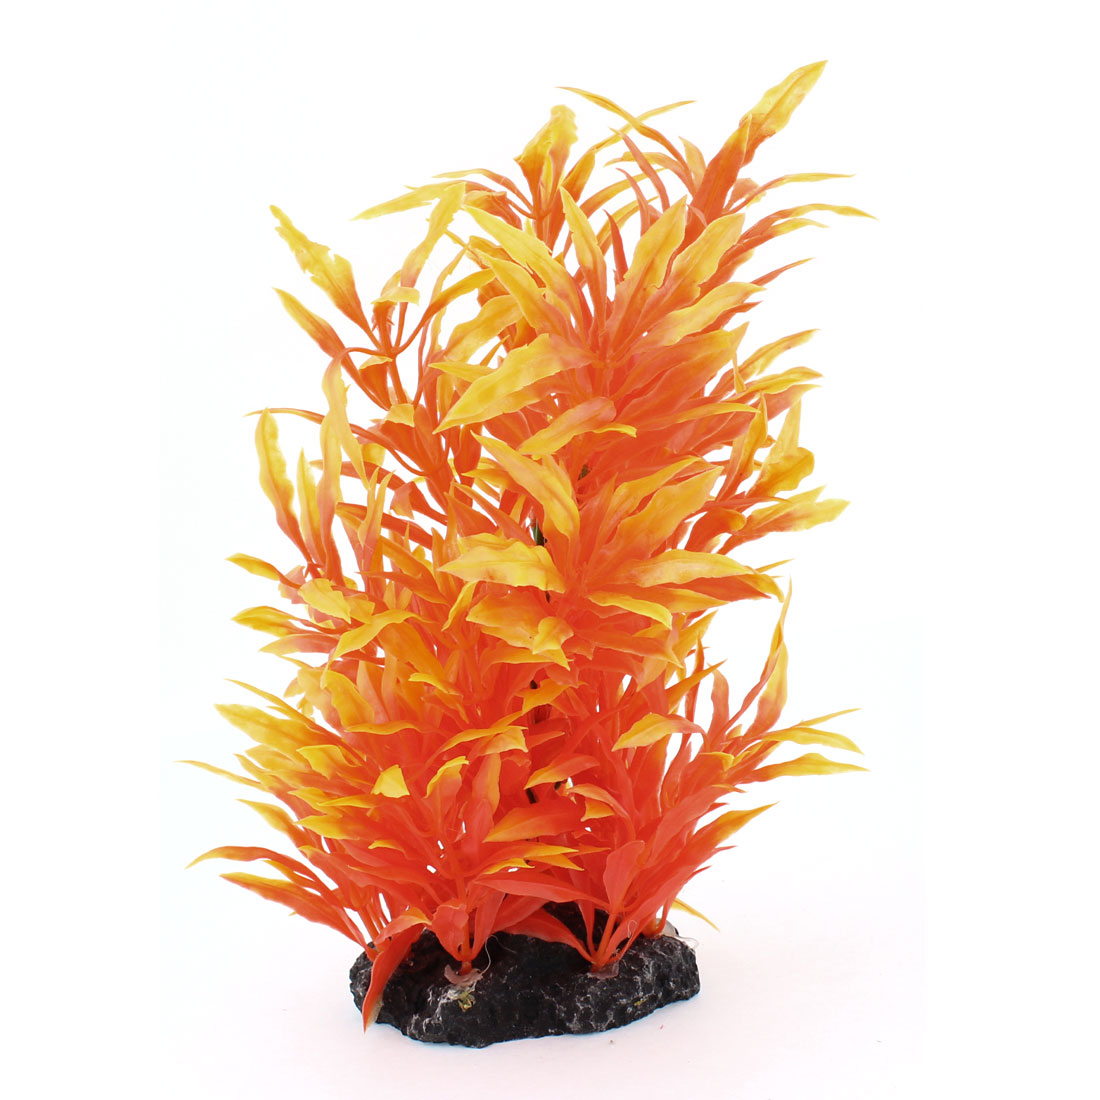 "8.3"" Height Artificial Orangered Grass Bush Decor Plastic Plant for Fish Tank"